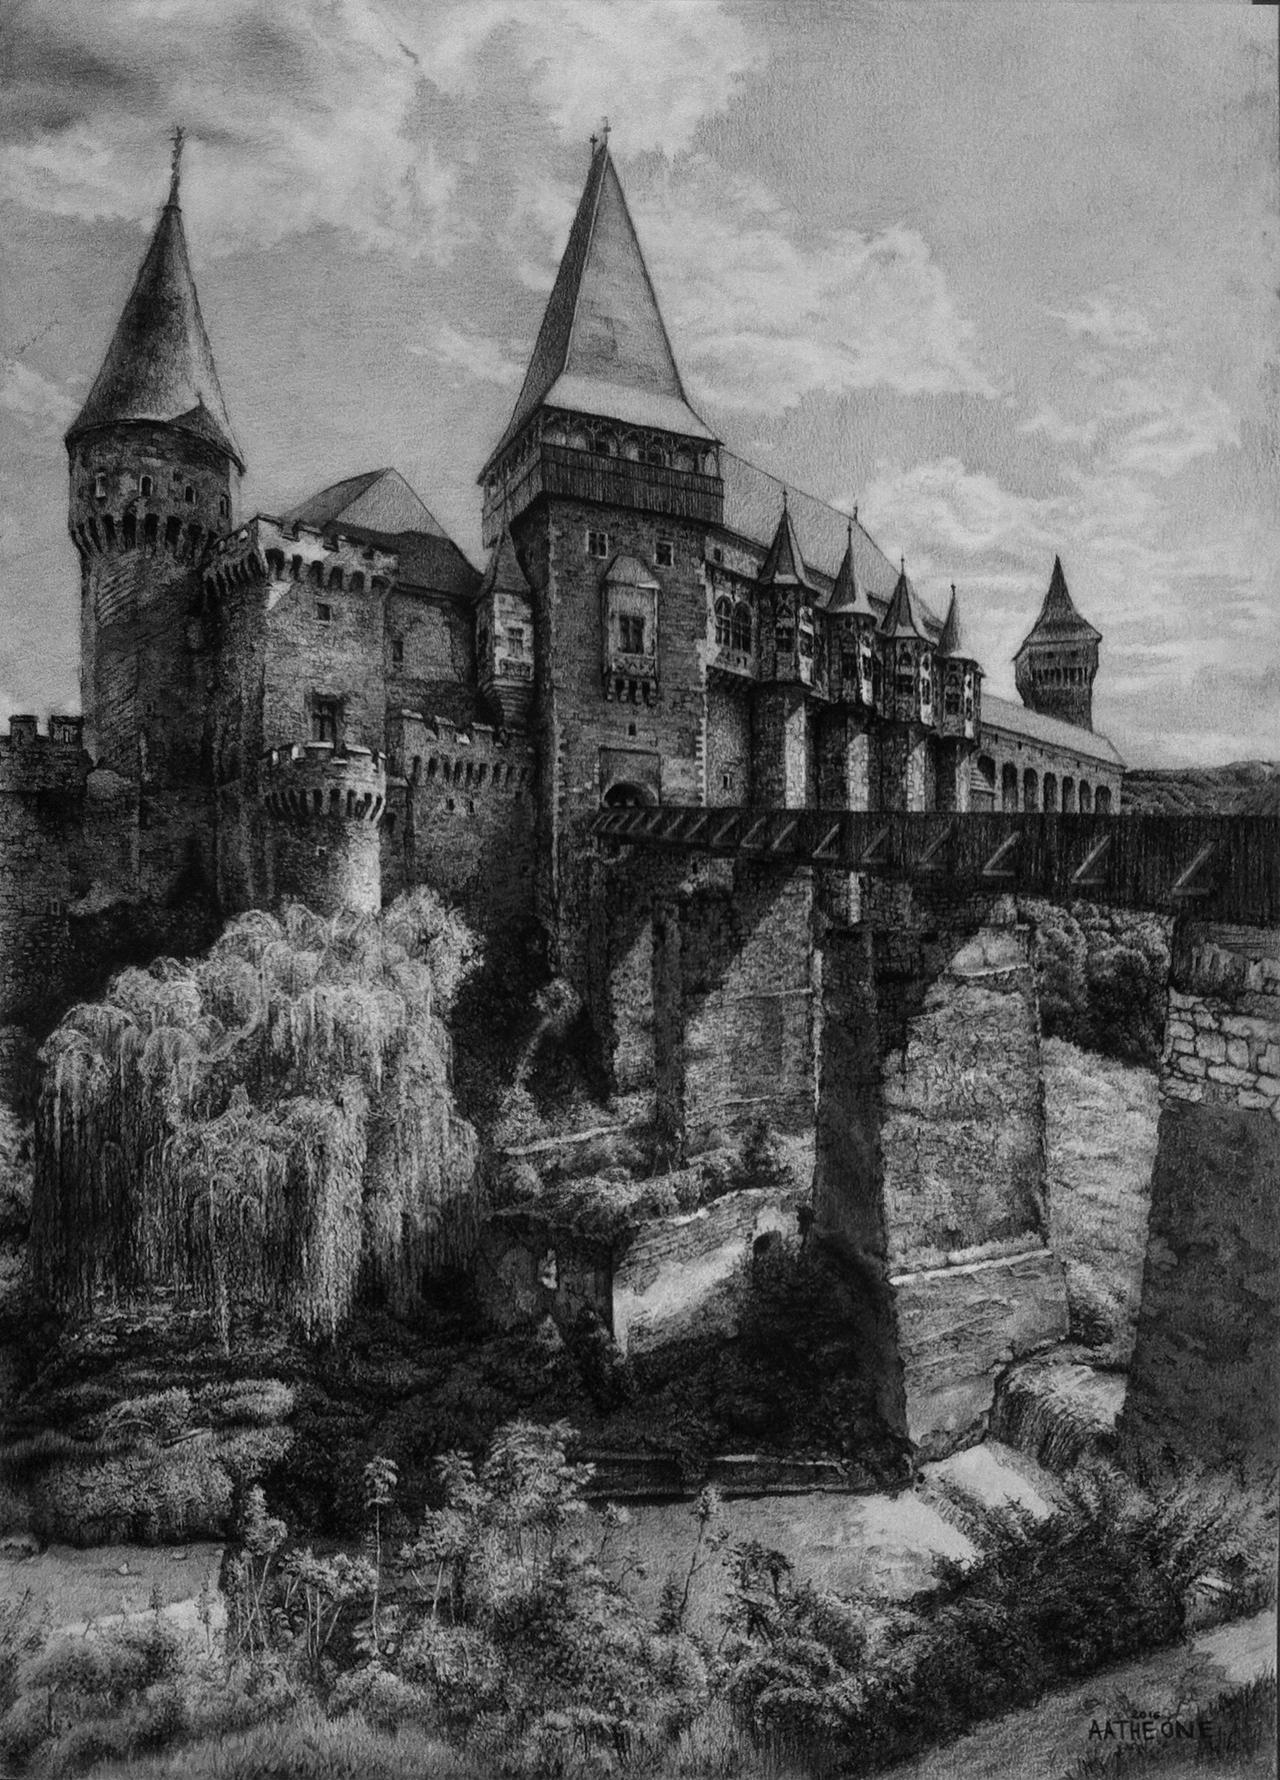 corvine castle drawing by aatheone corvine castle drawing by aatheone - Traditional Castle 2016